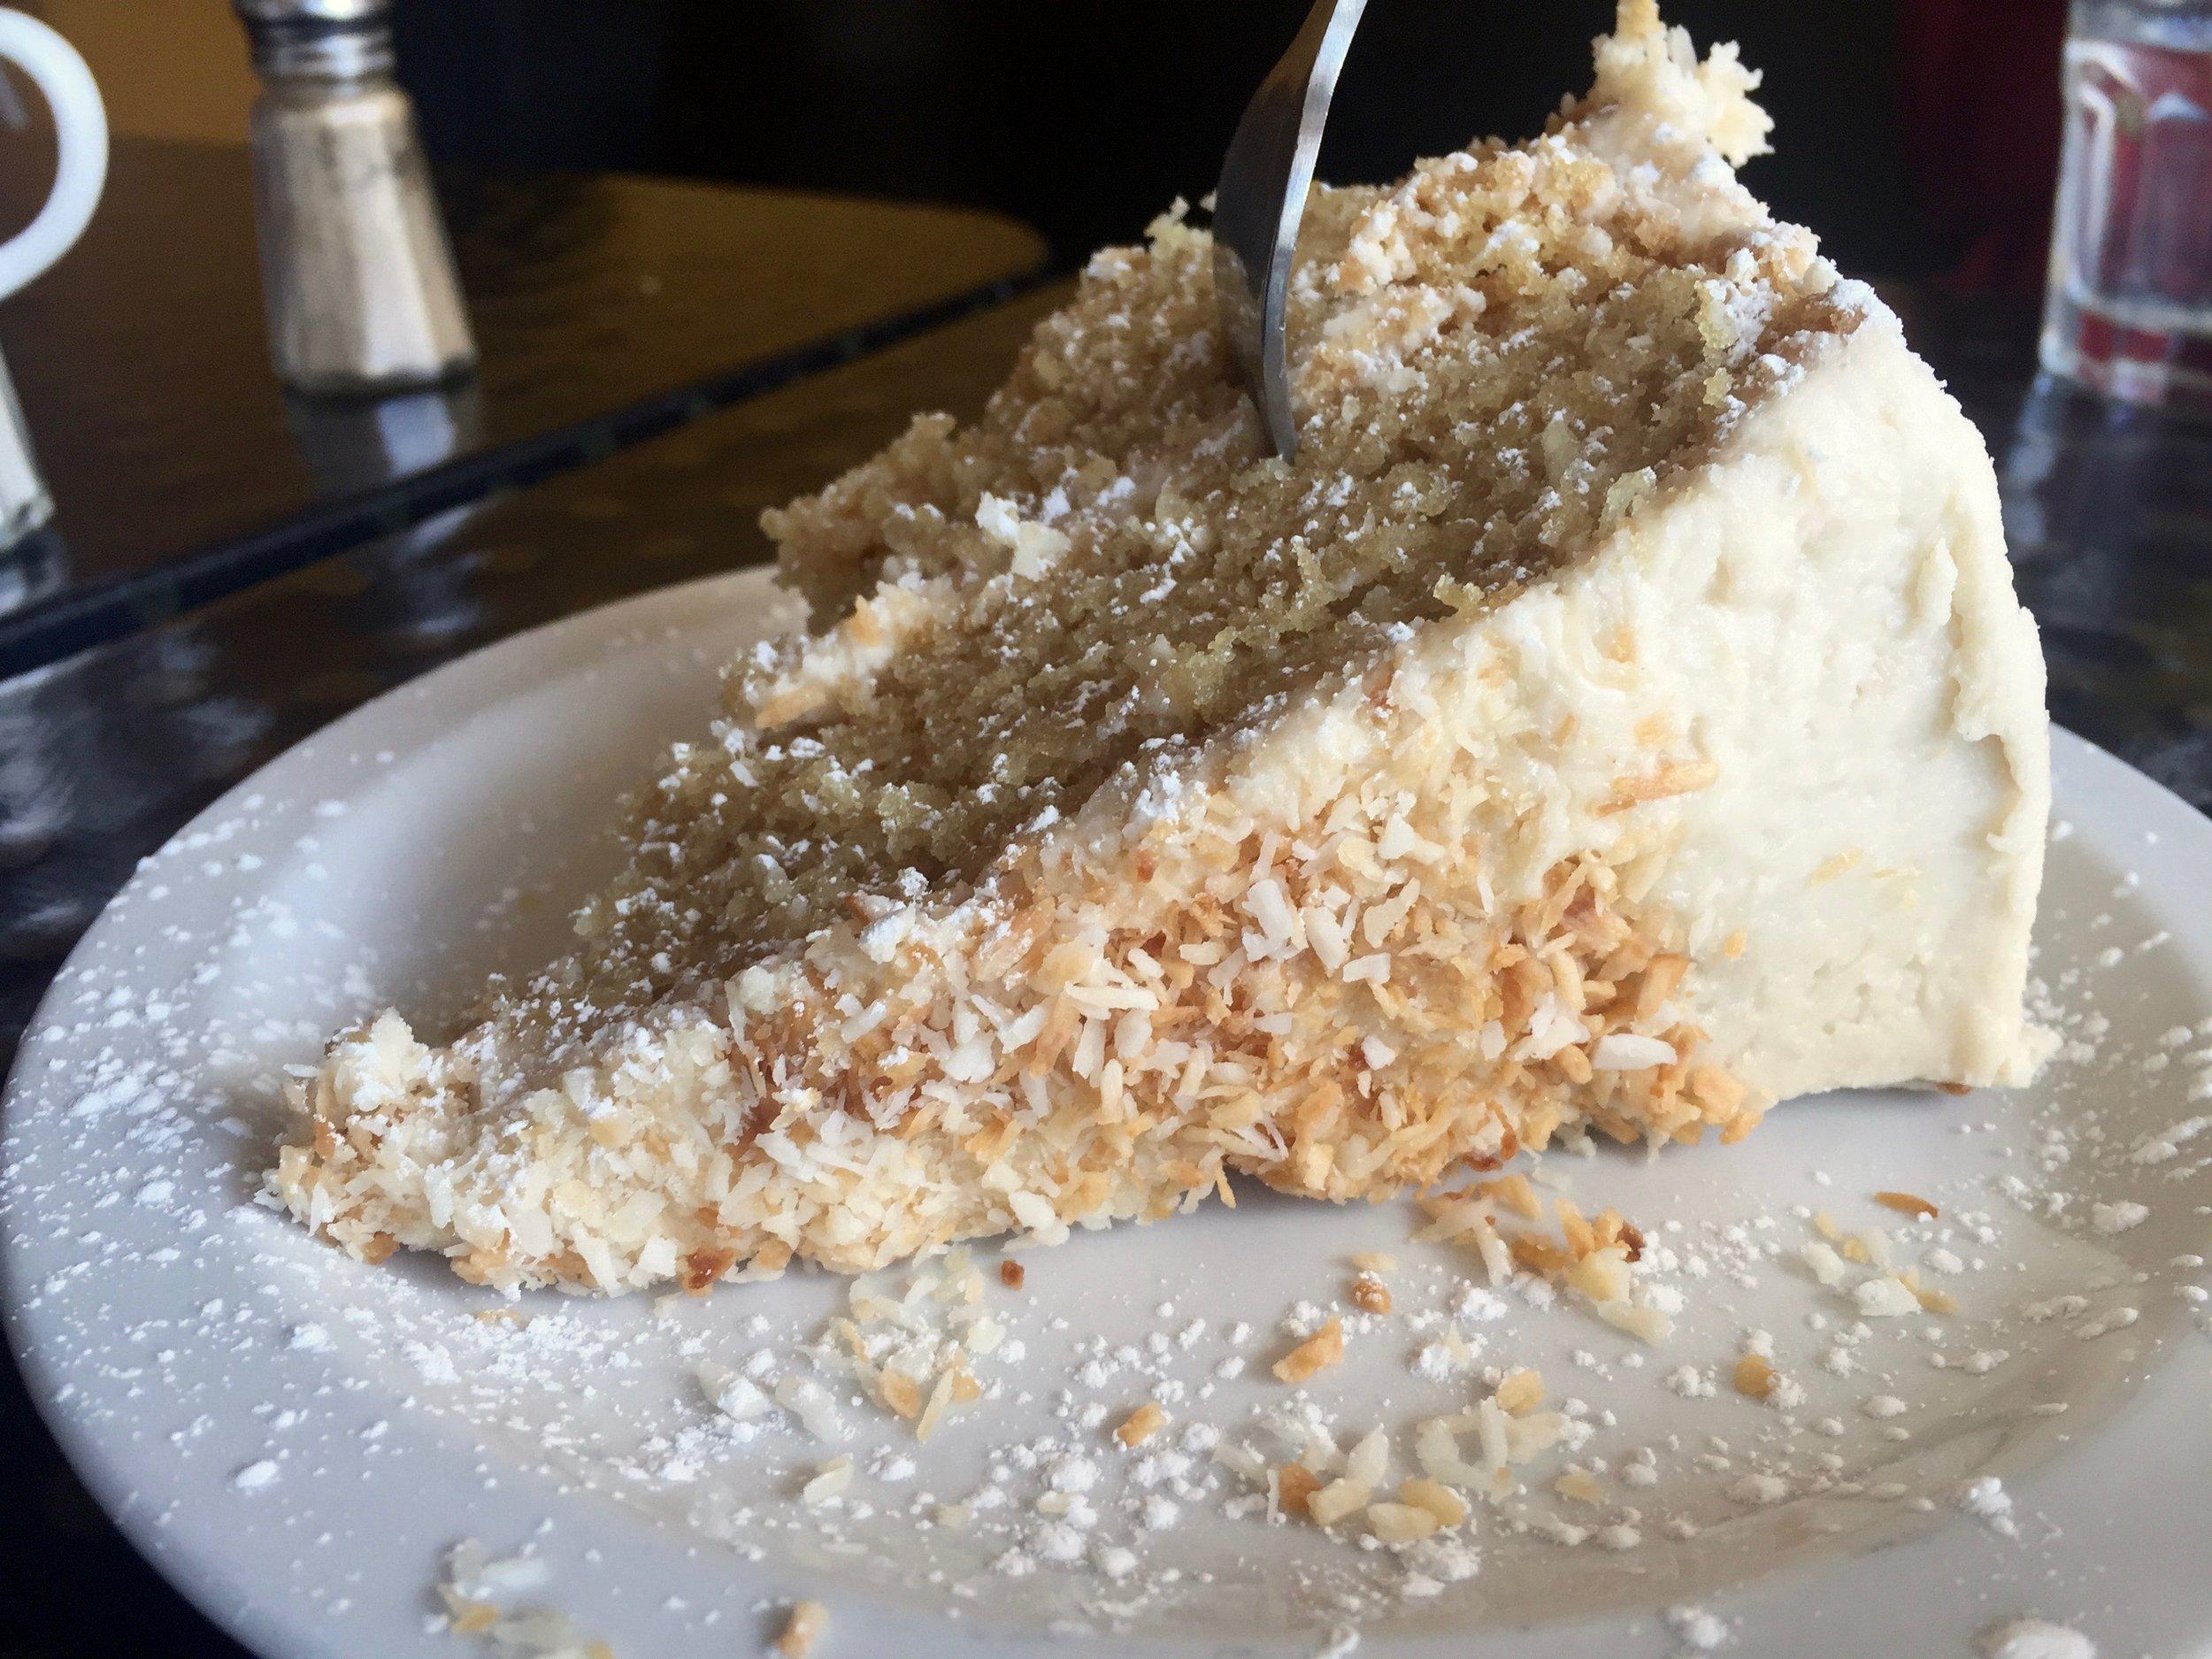 Vegan Coconut Cake from the Rosendale Cafe